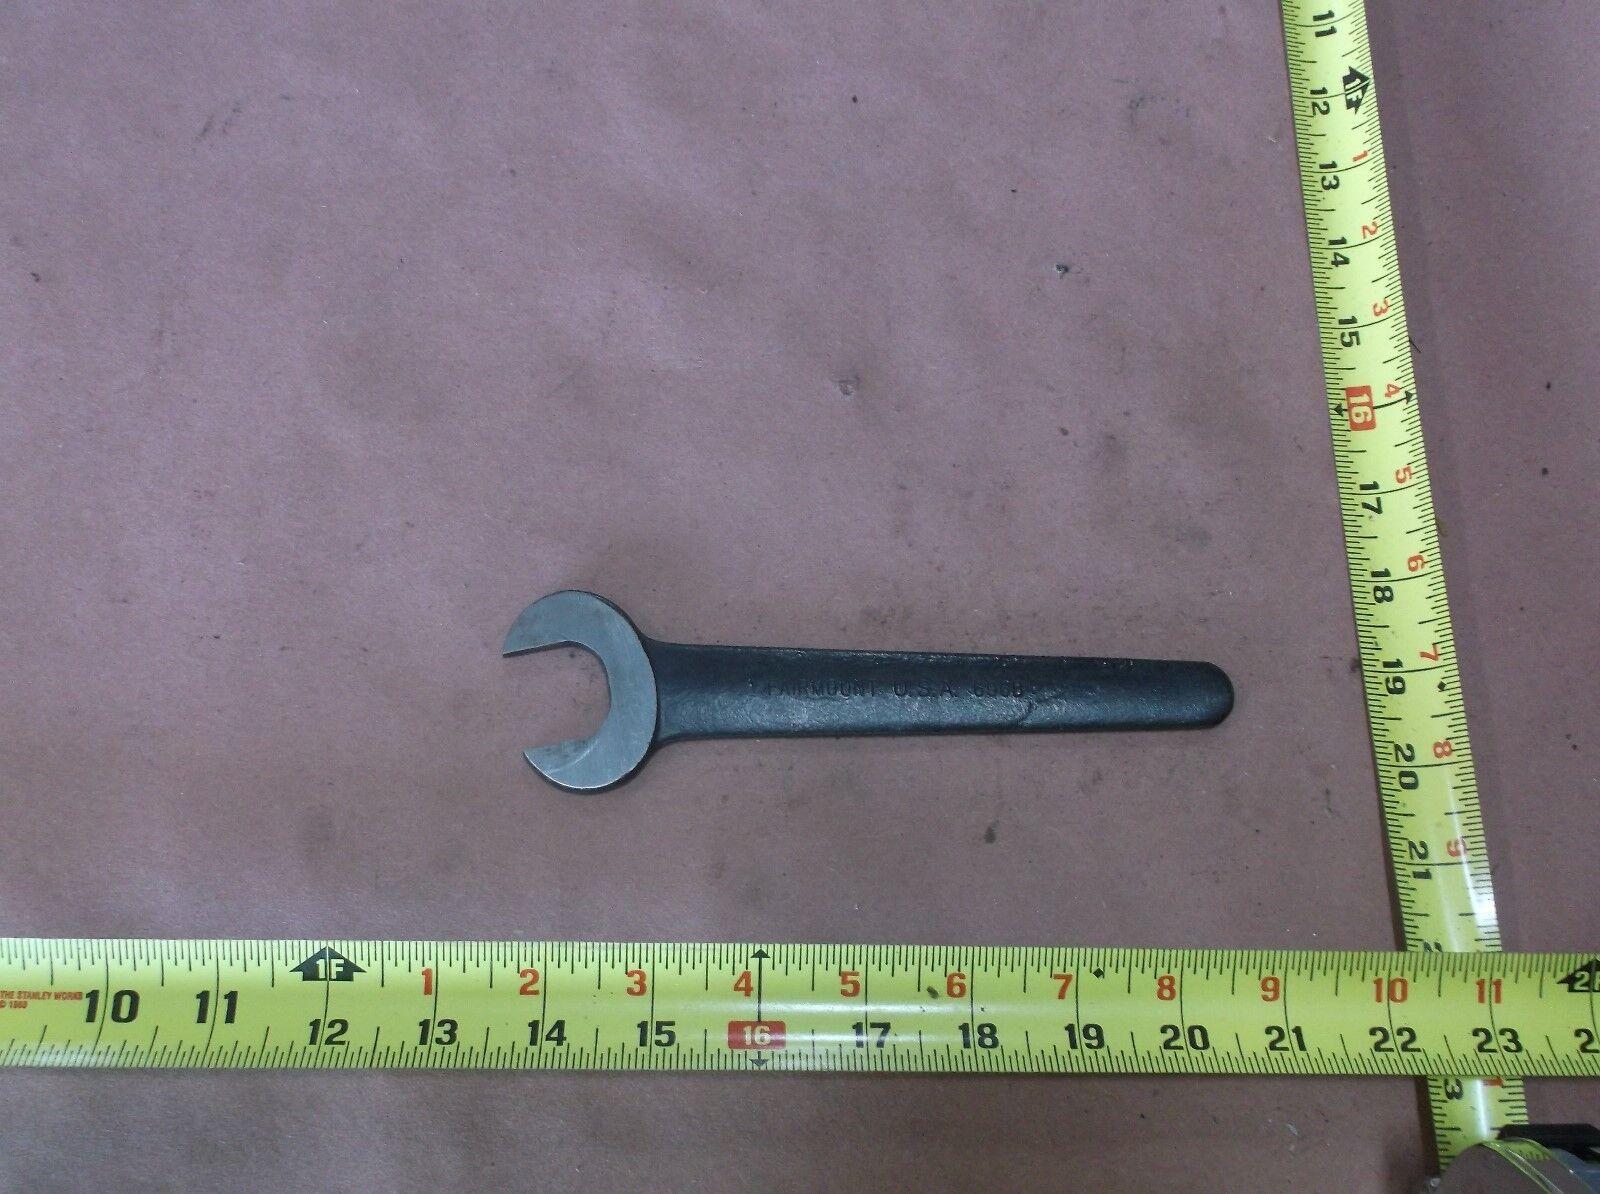 "Fairmount 606B, 1"" Open End Spanner Wrench"